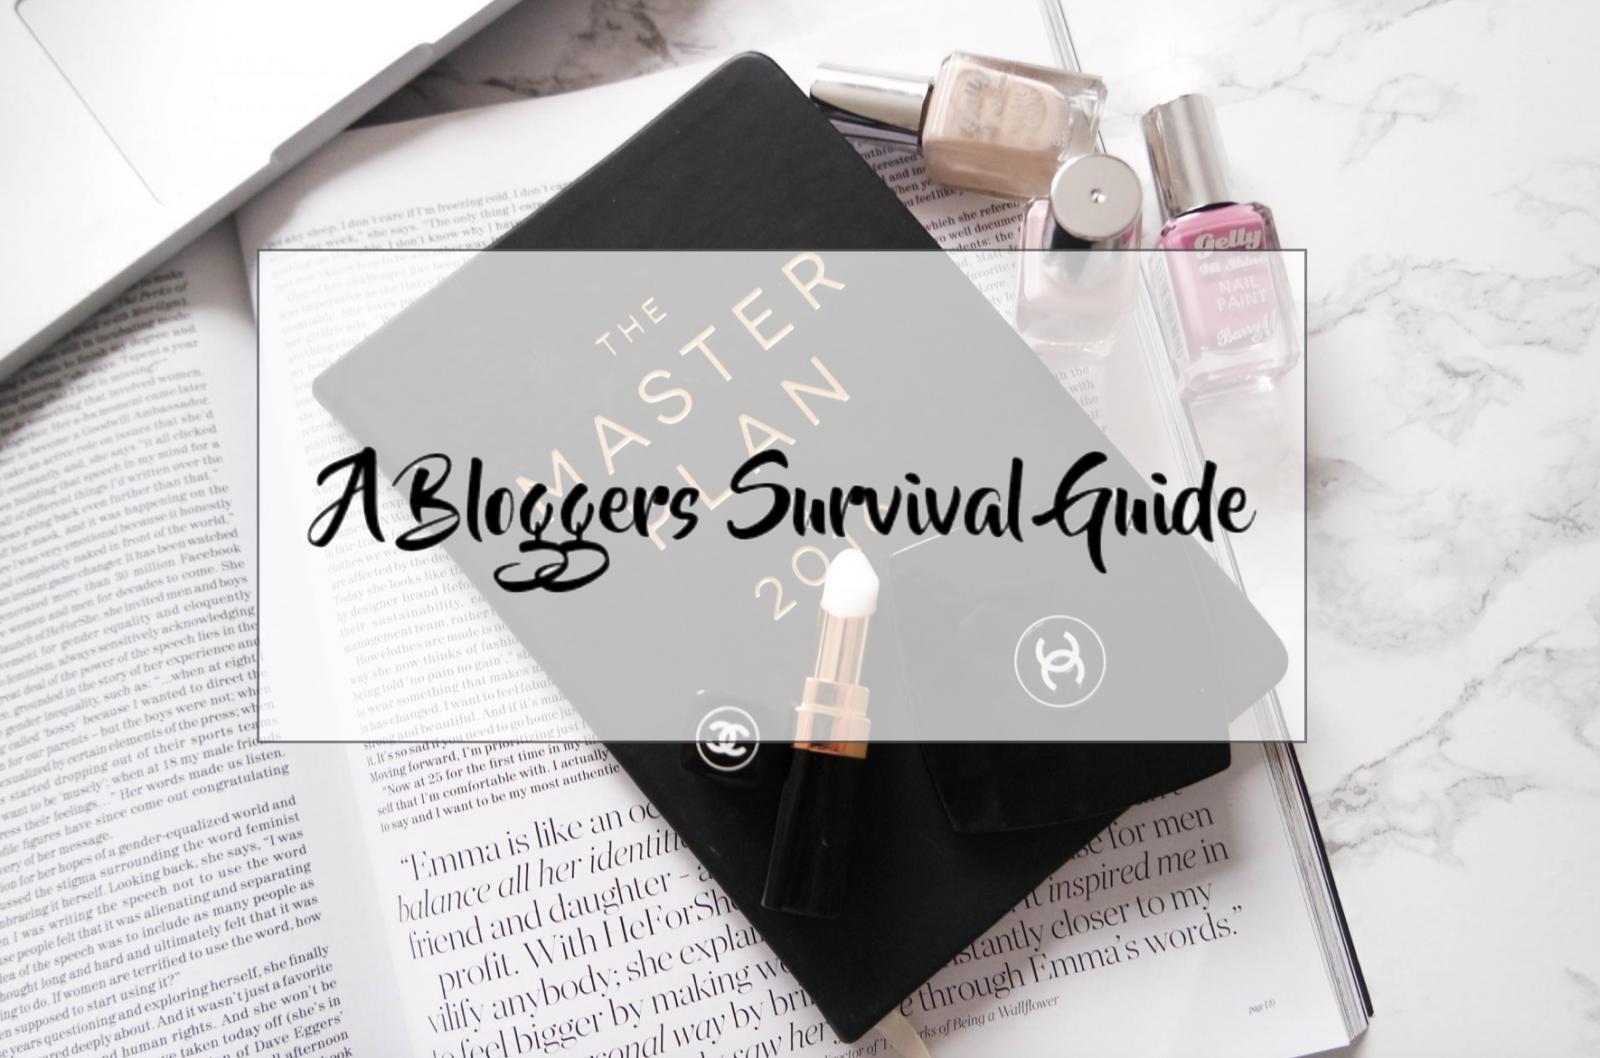 A Bloggers Survival Guide